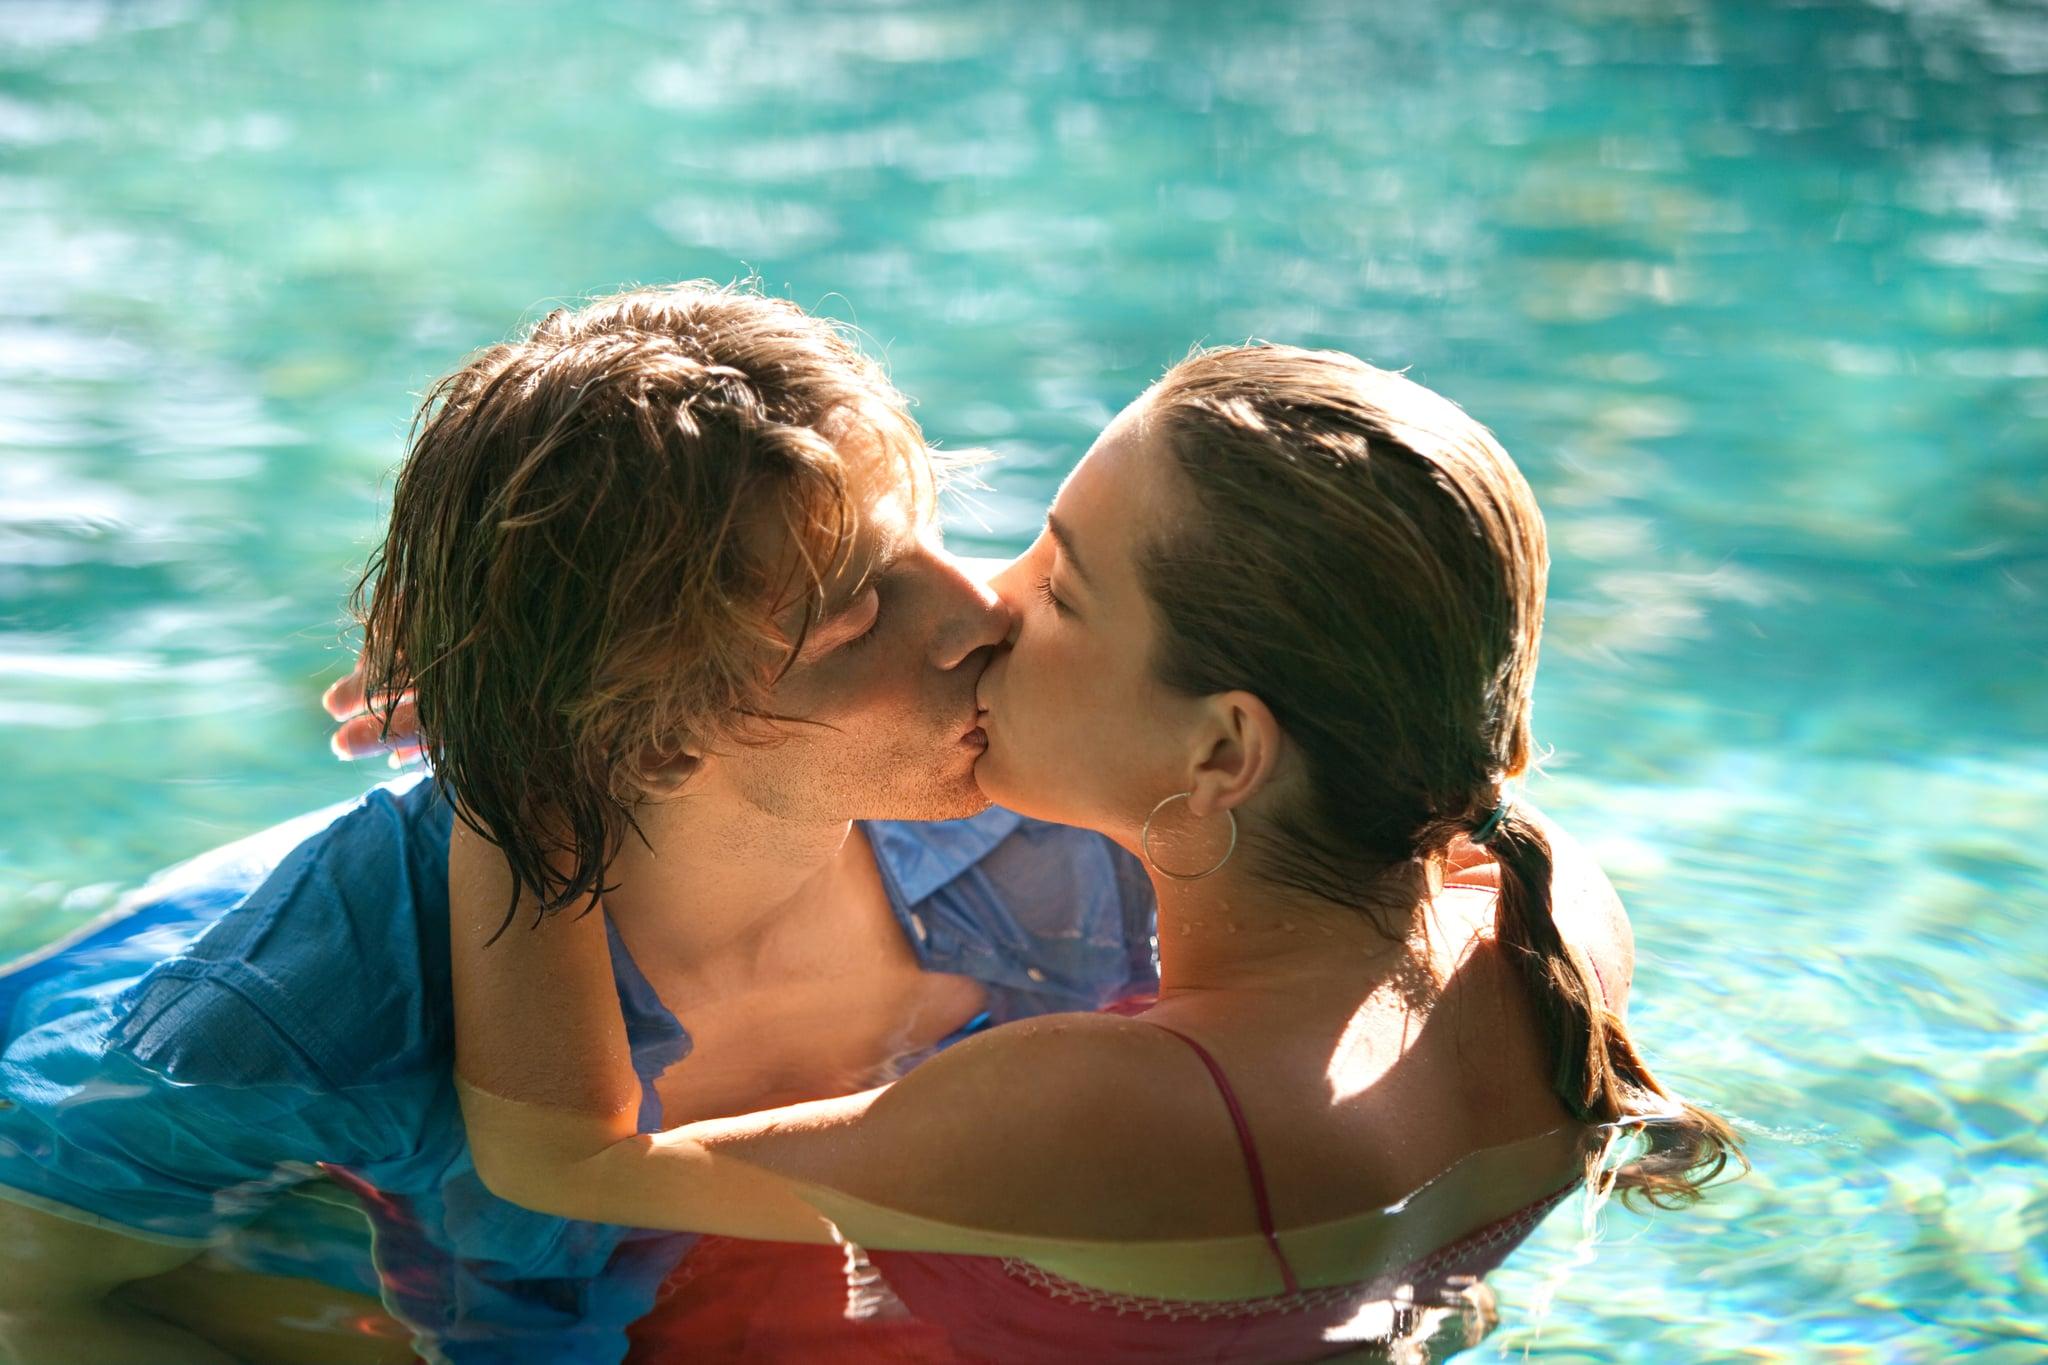 Sex In Water  Is It Safe  Popsugar Love  Sex-9423